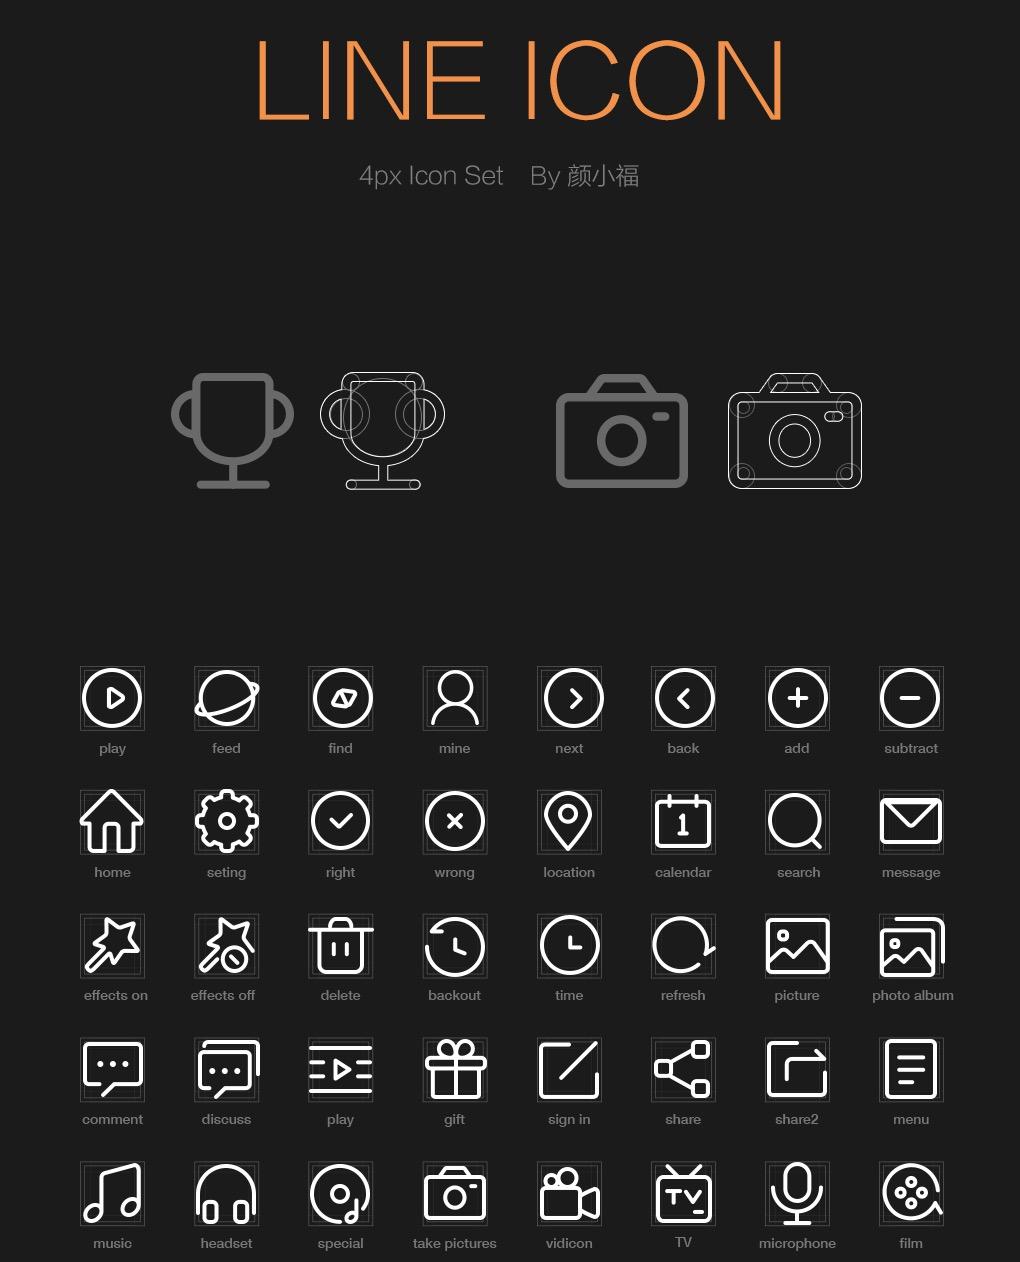 4px line icon 绘制教程